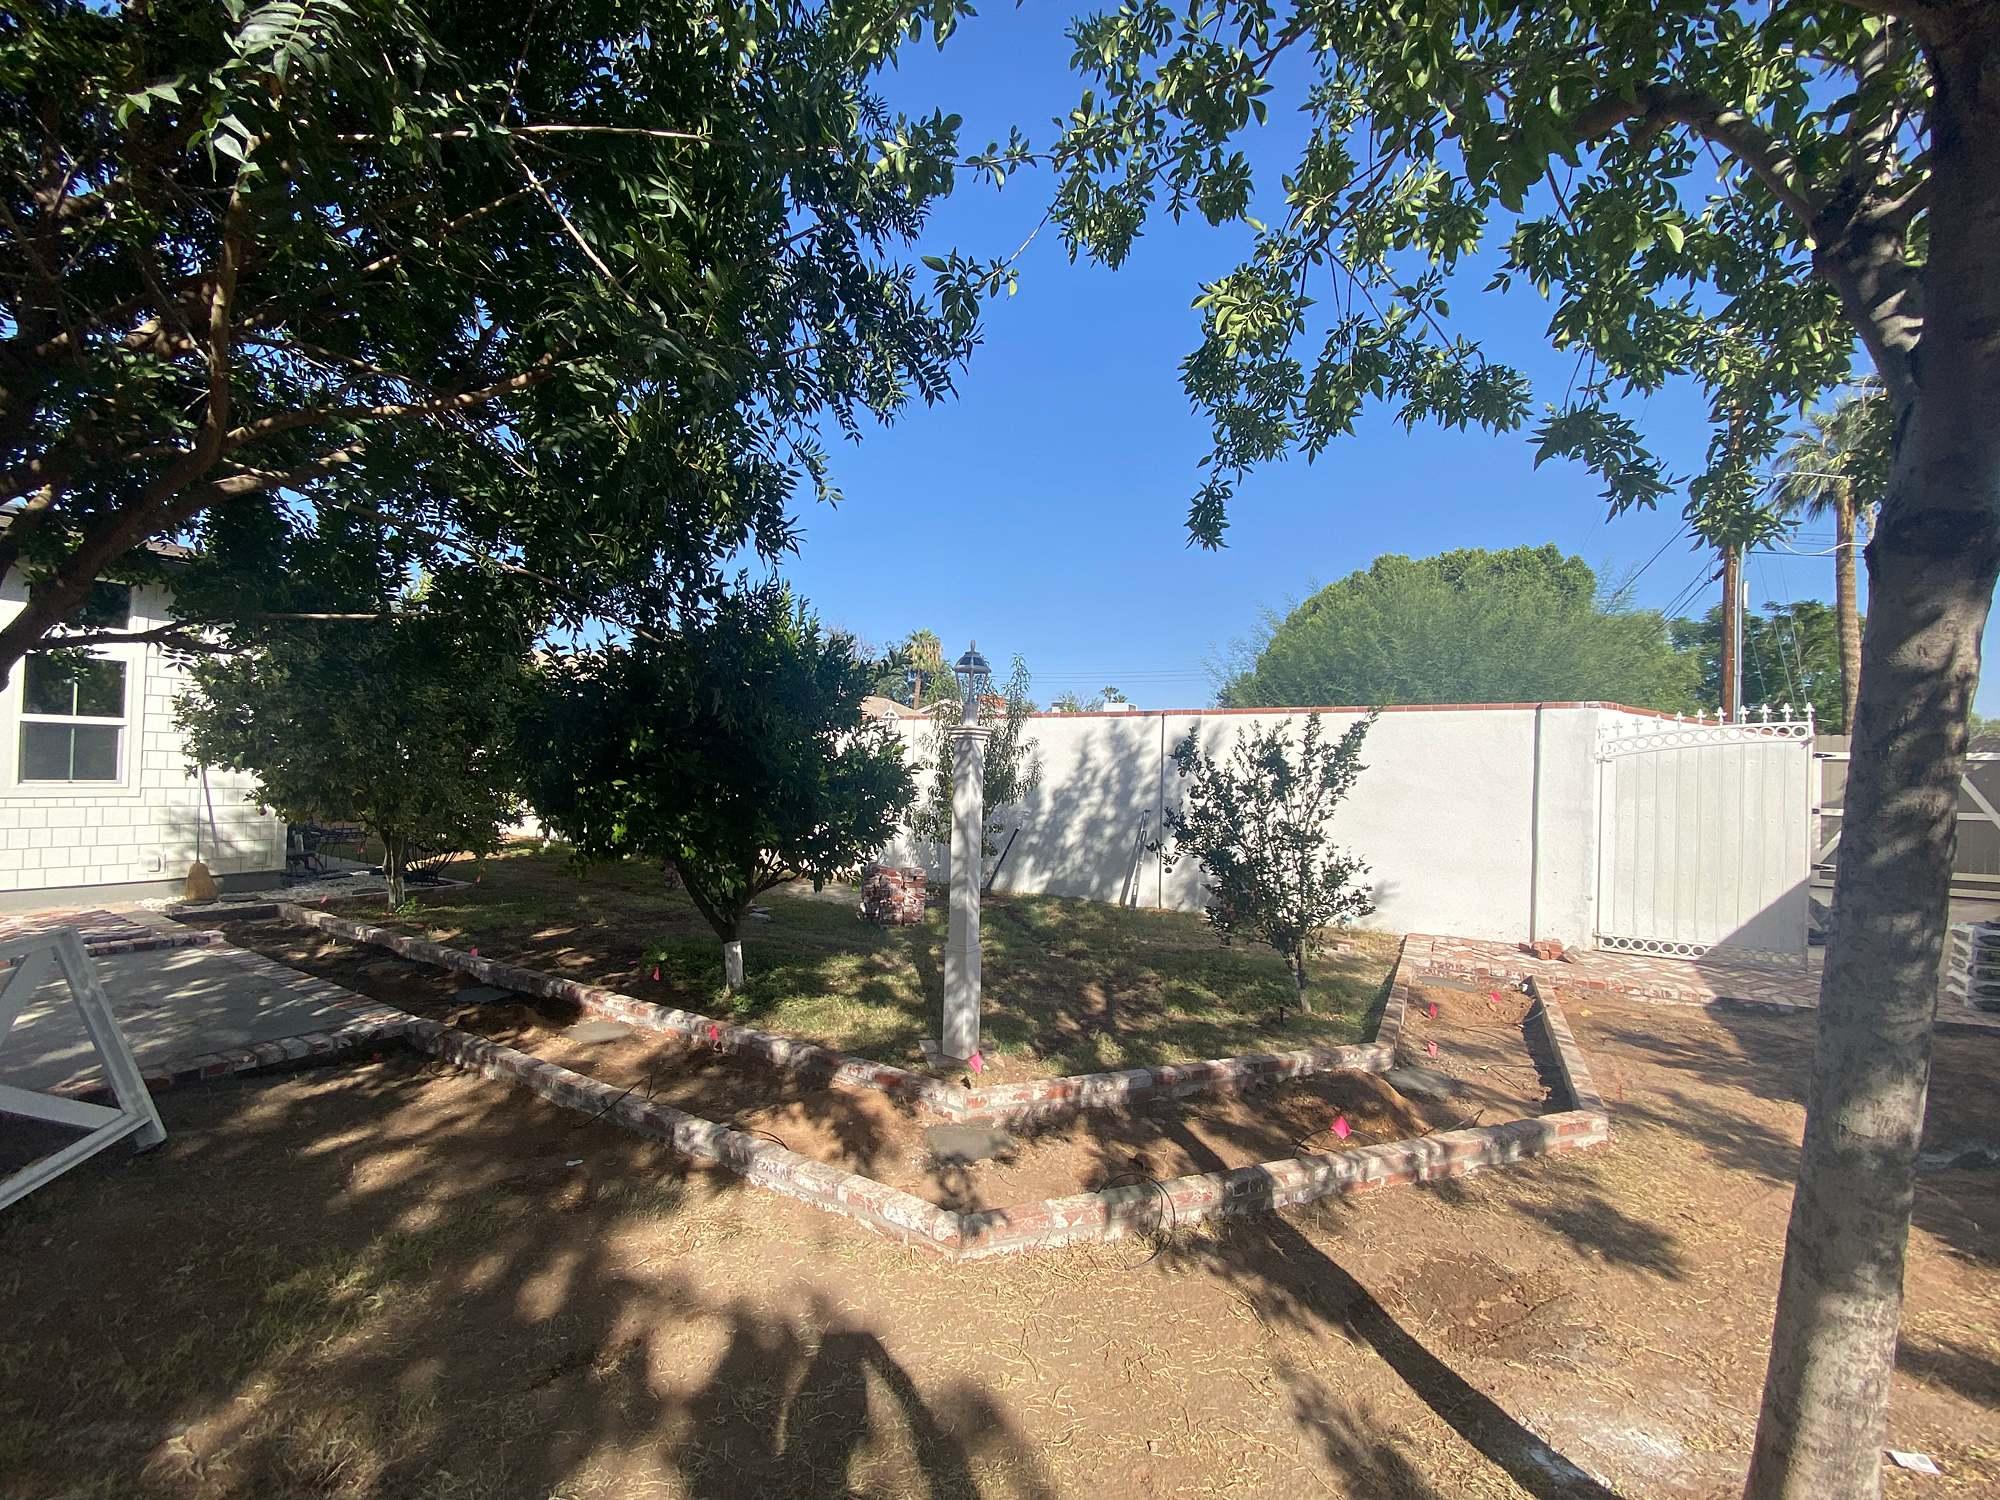 small orchard area in backyard home in Phoenix Arizona